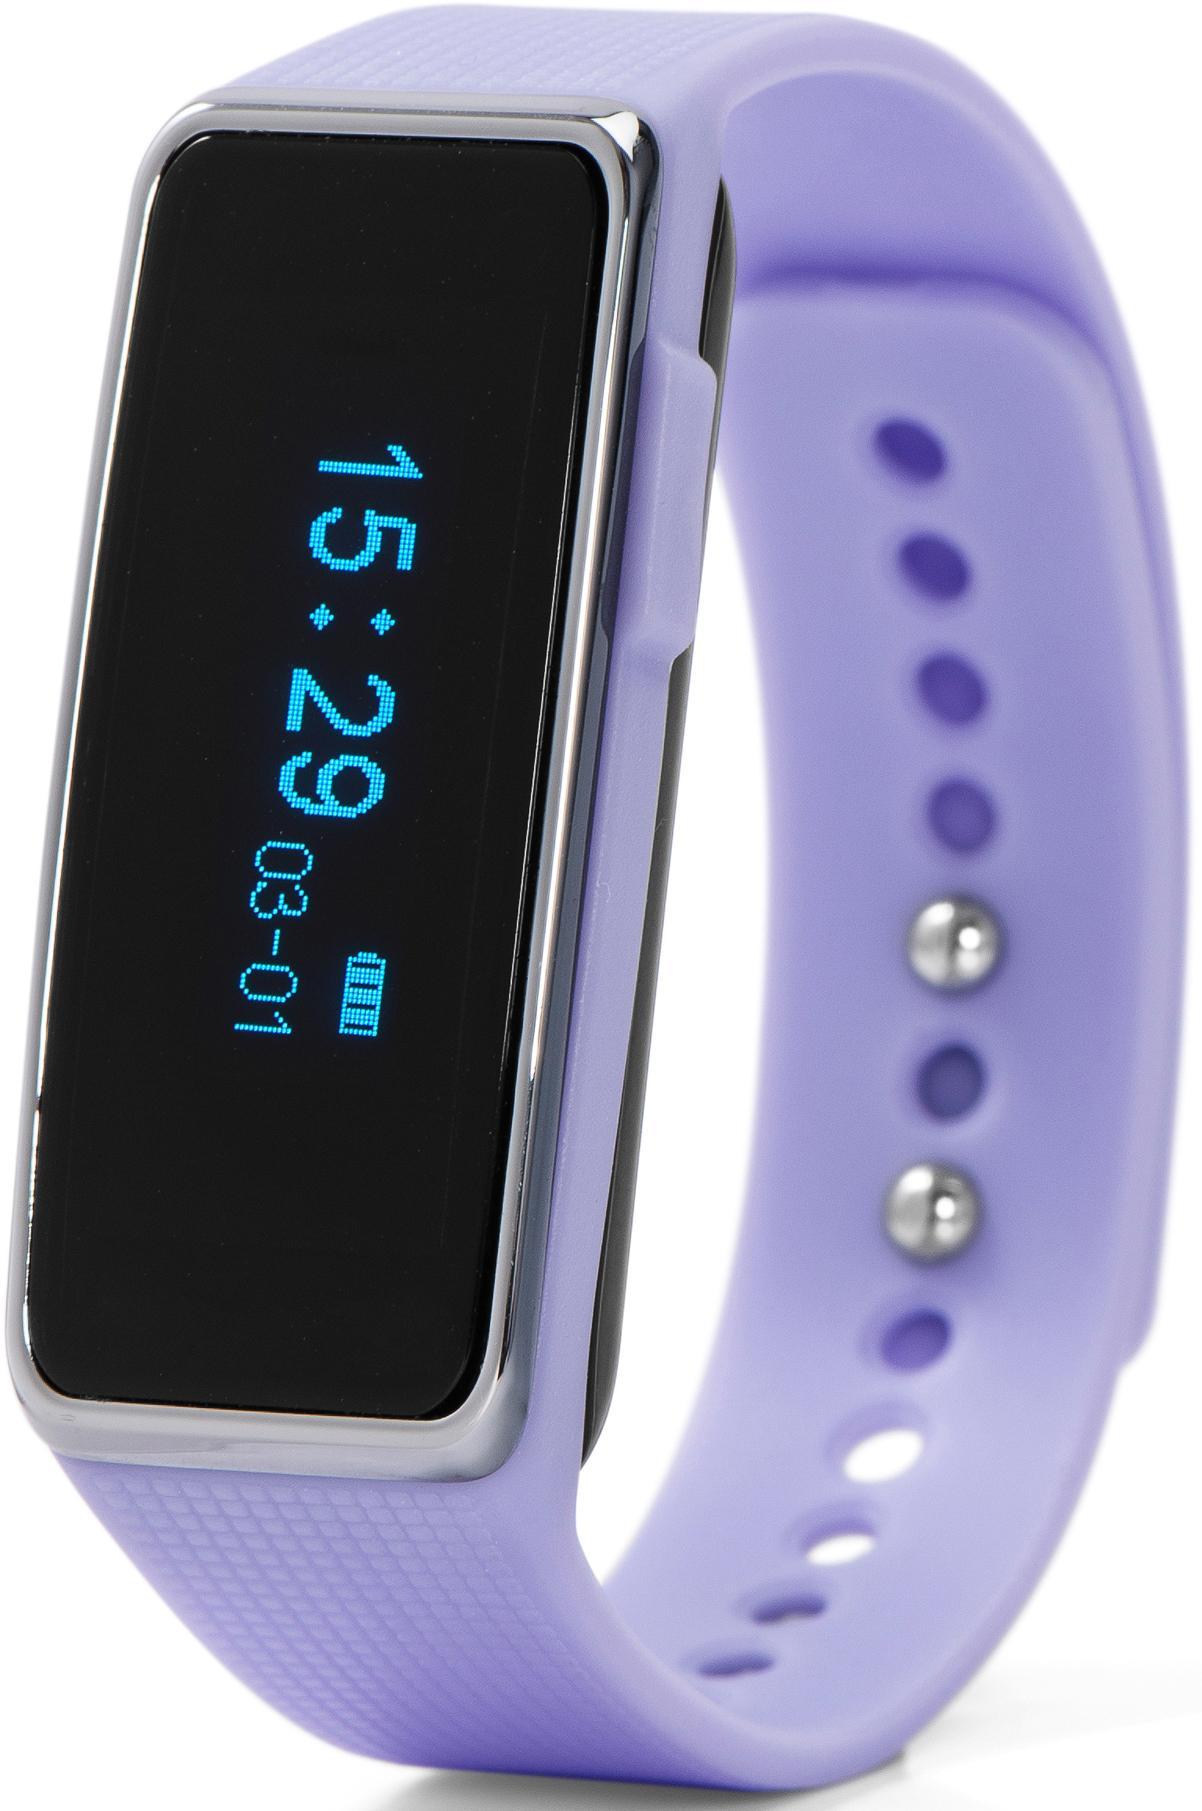 Nuband Activ Fitness Tracker - Lilac